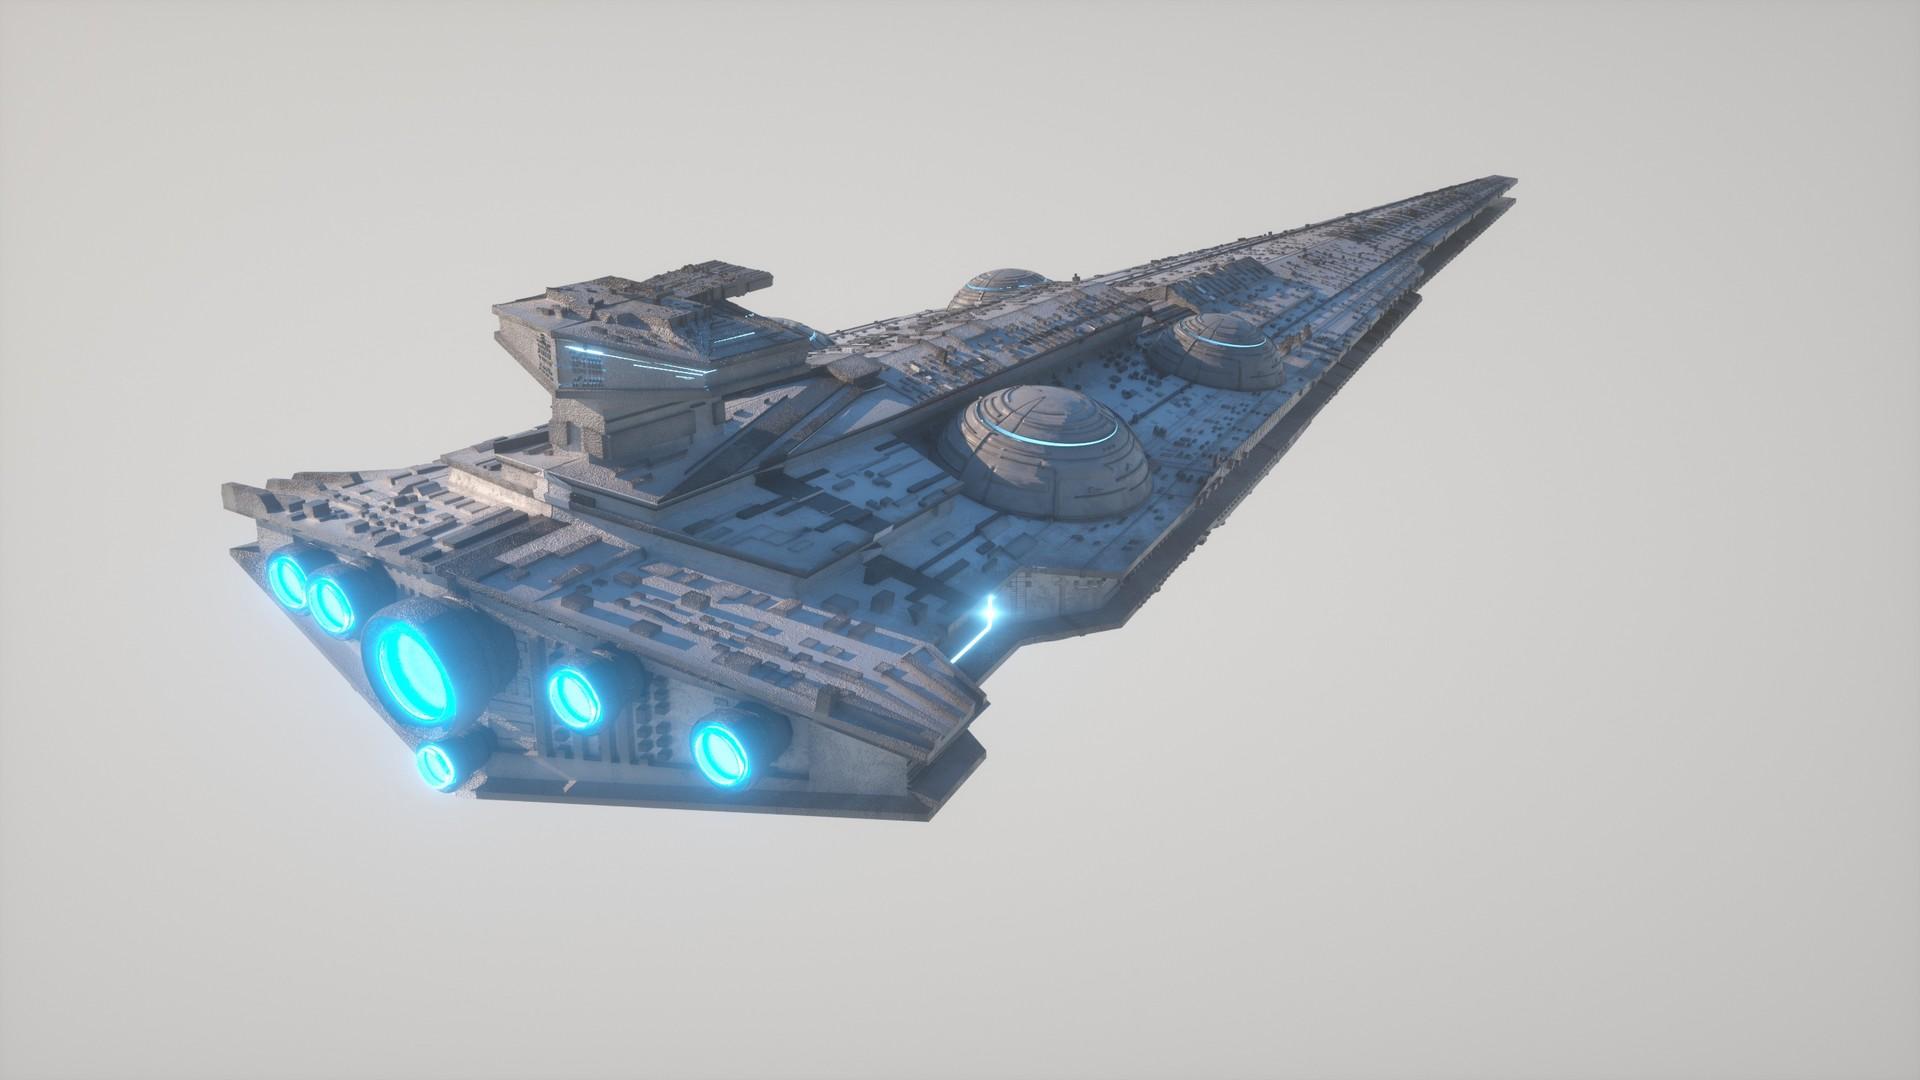 Kresimir jelusic 53 301115 interdictor cruiser star destroyer class clean3